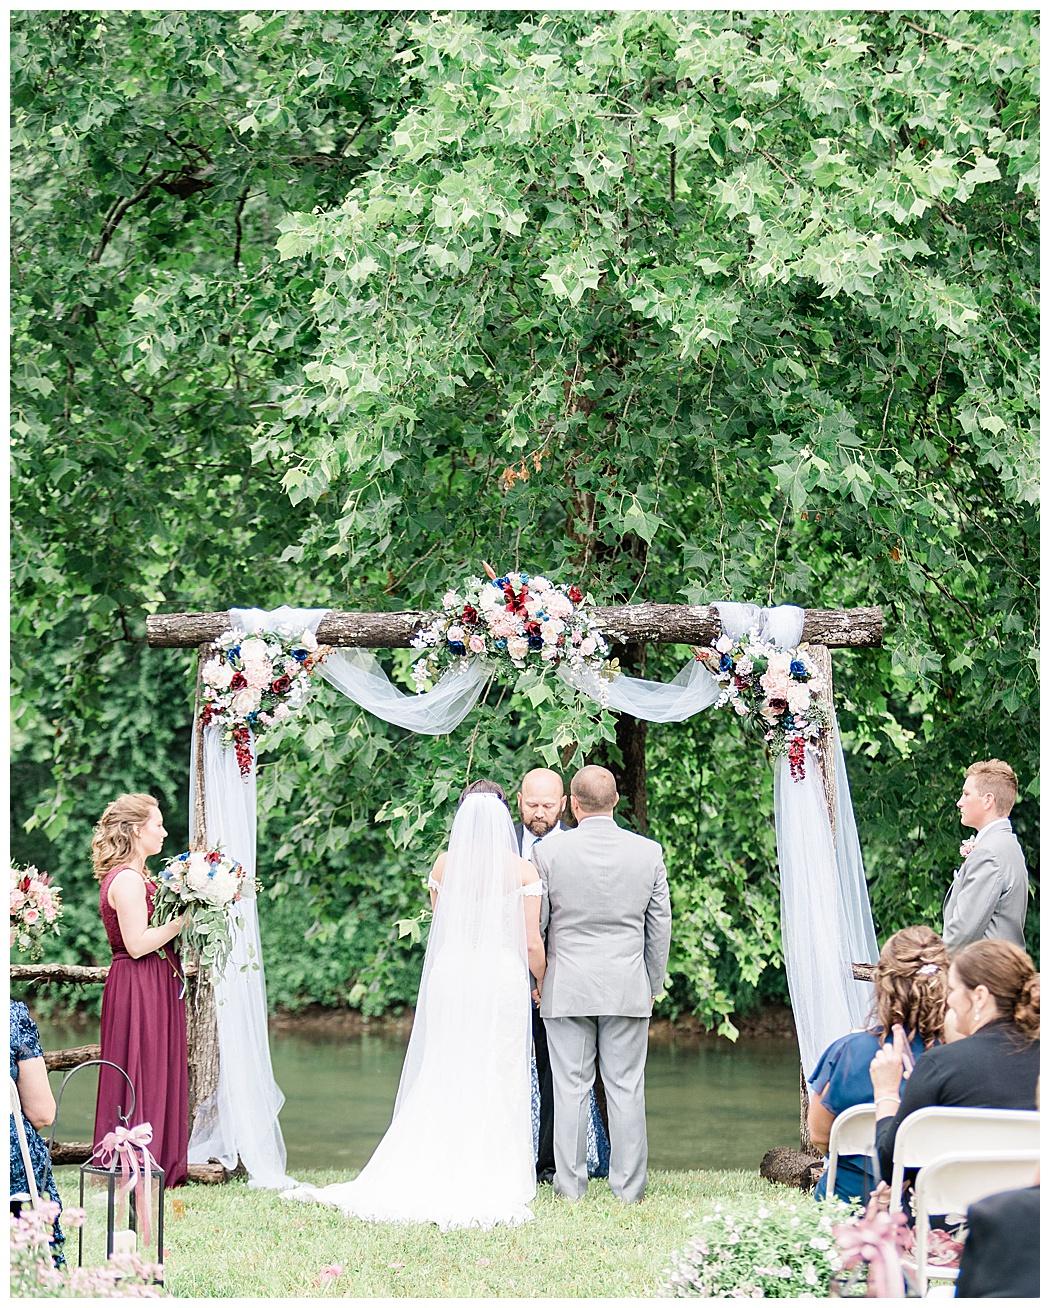 River-Uplands-Farm-Wedding-Photographer_0080.jpg